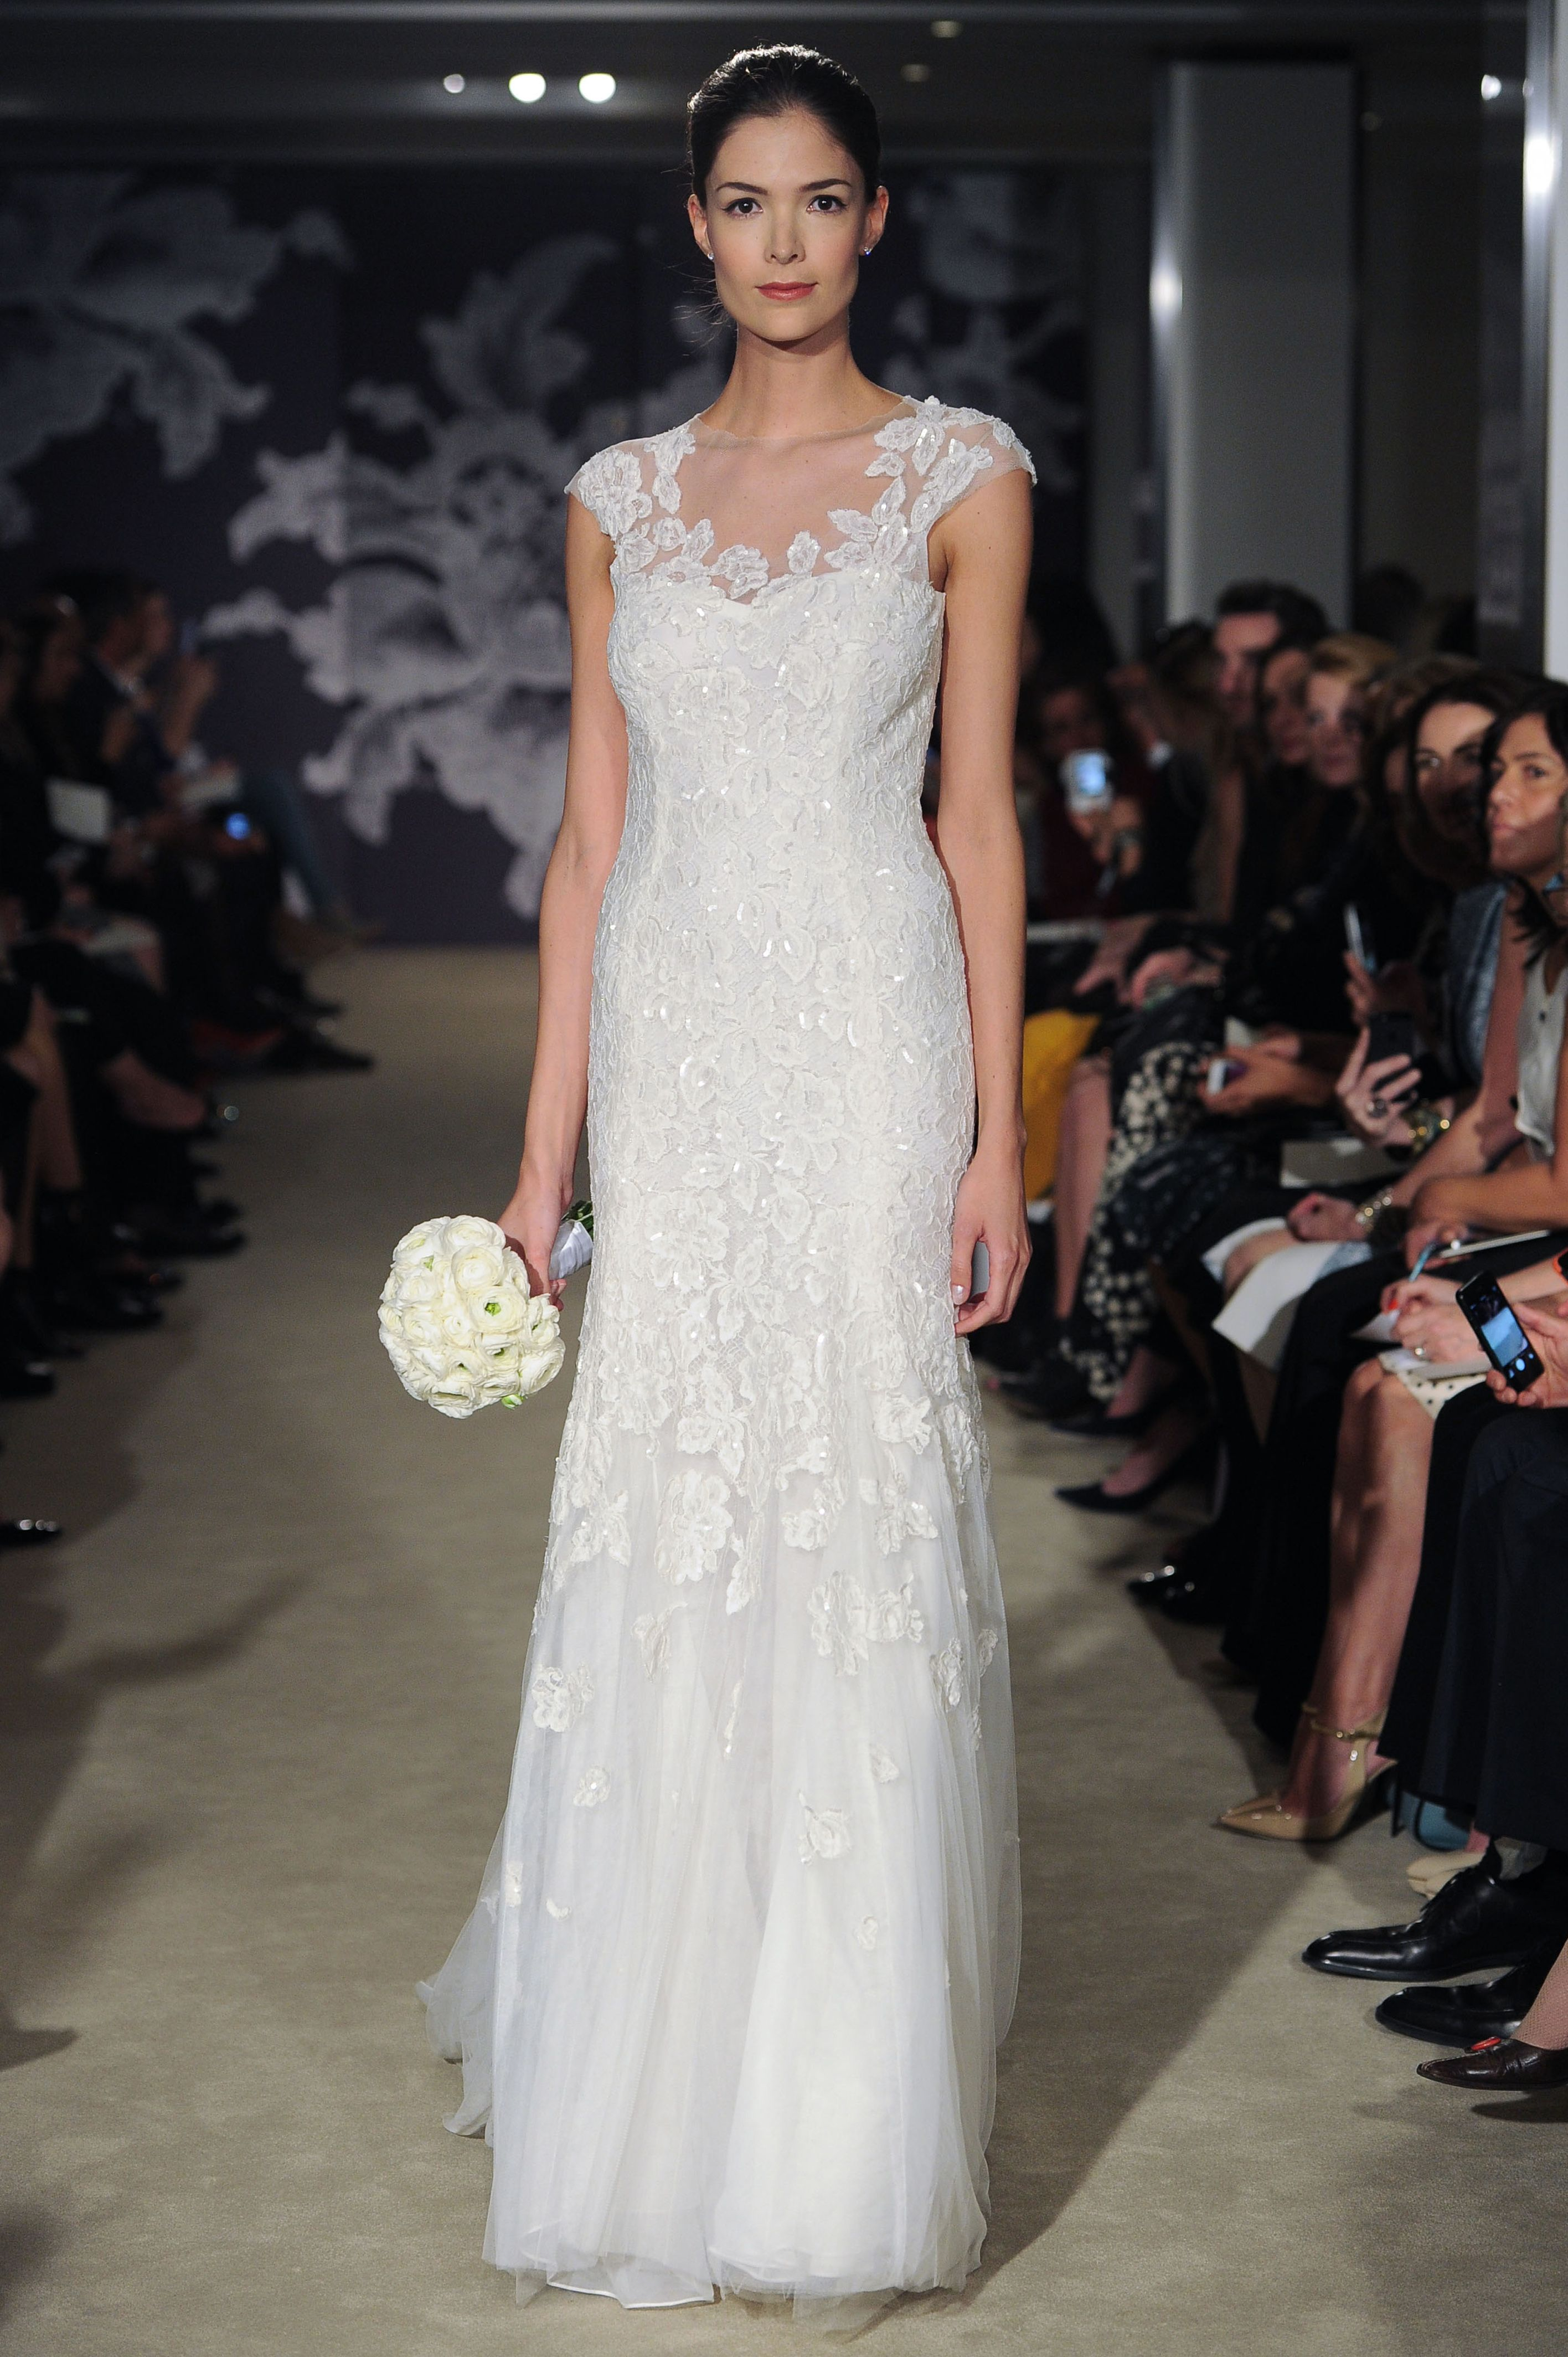 The Claire gown #CarolinaHerrera #bridal